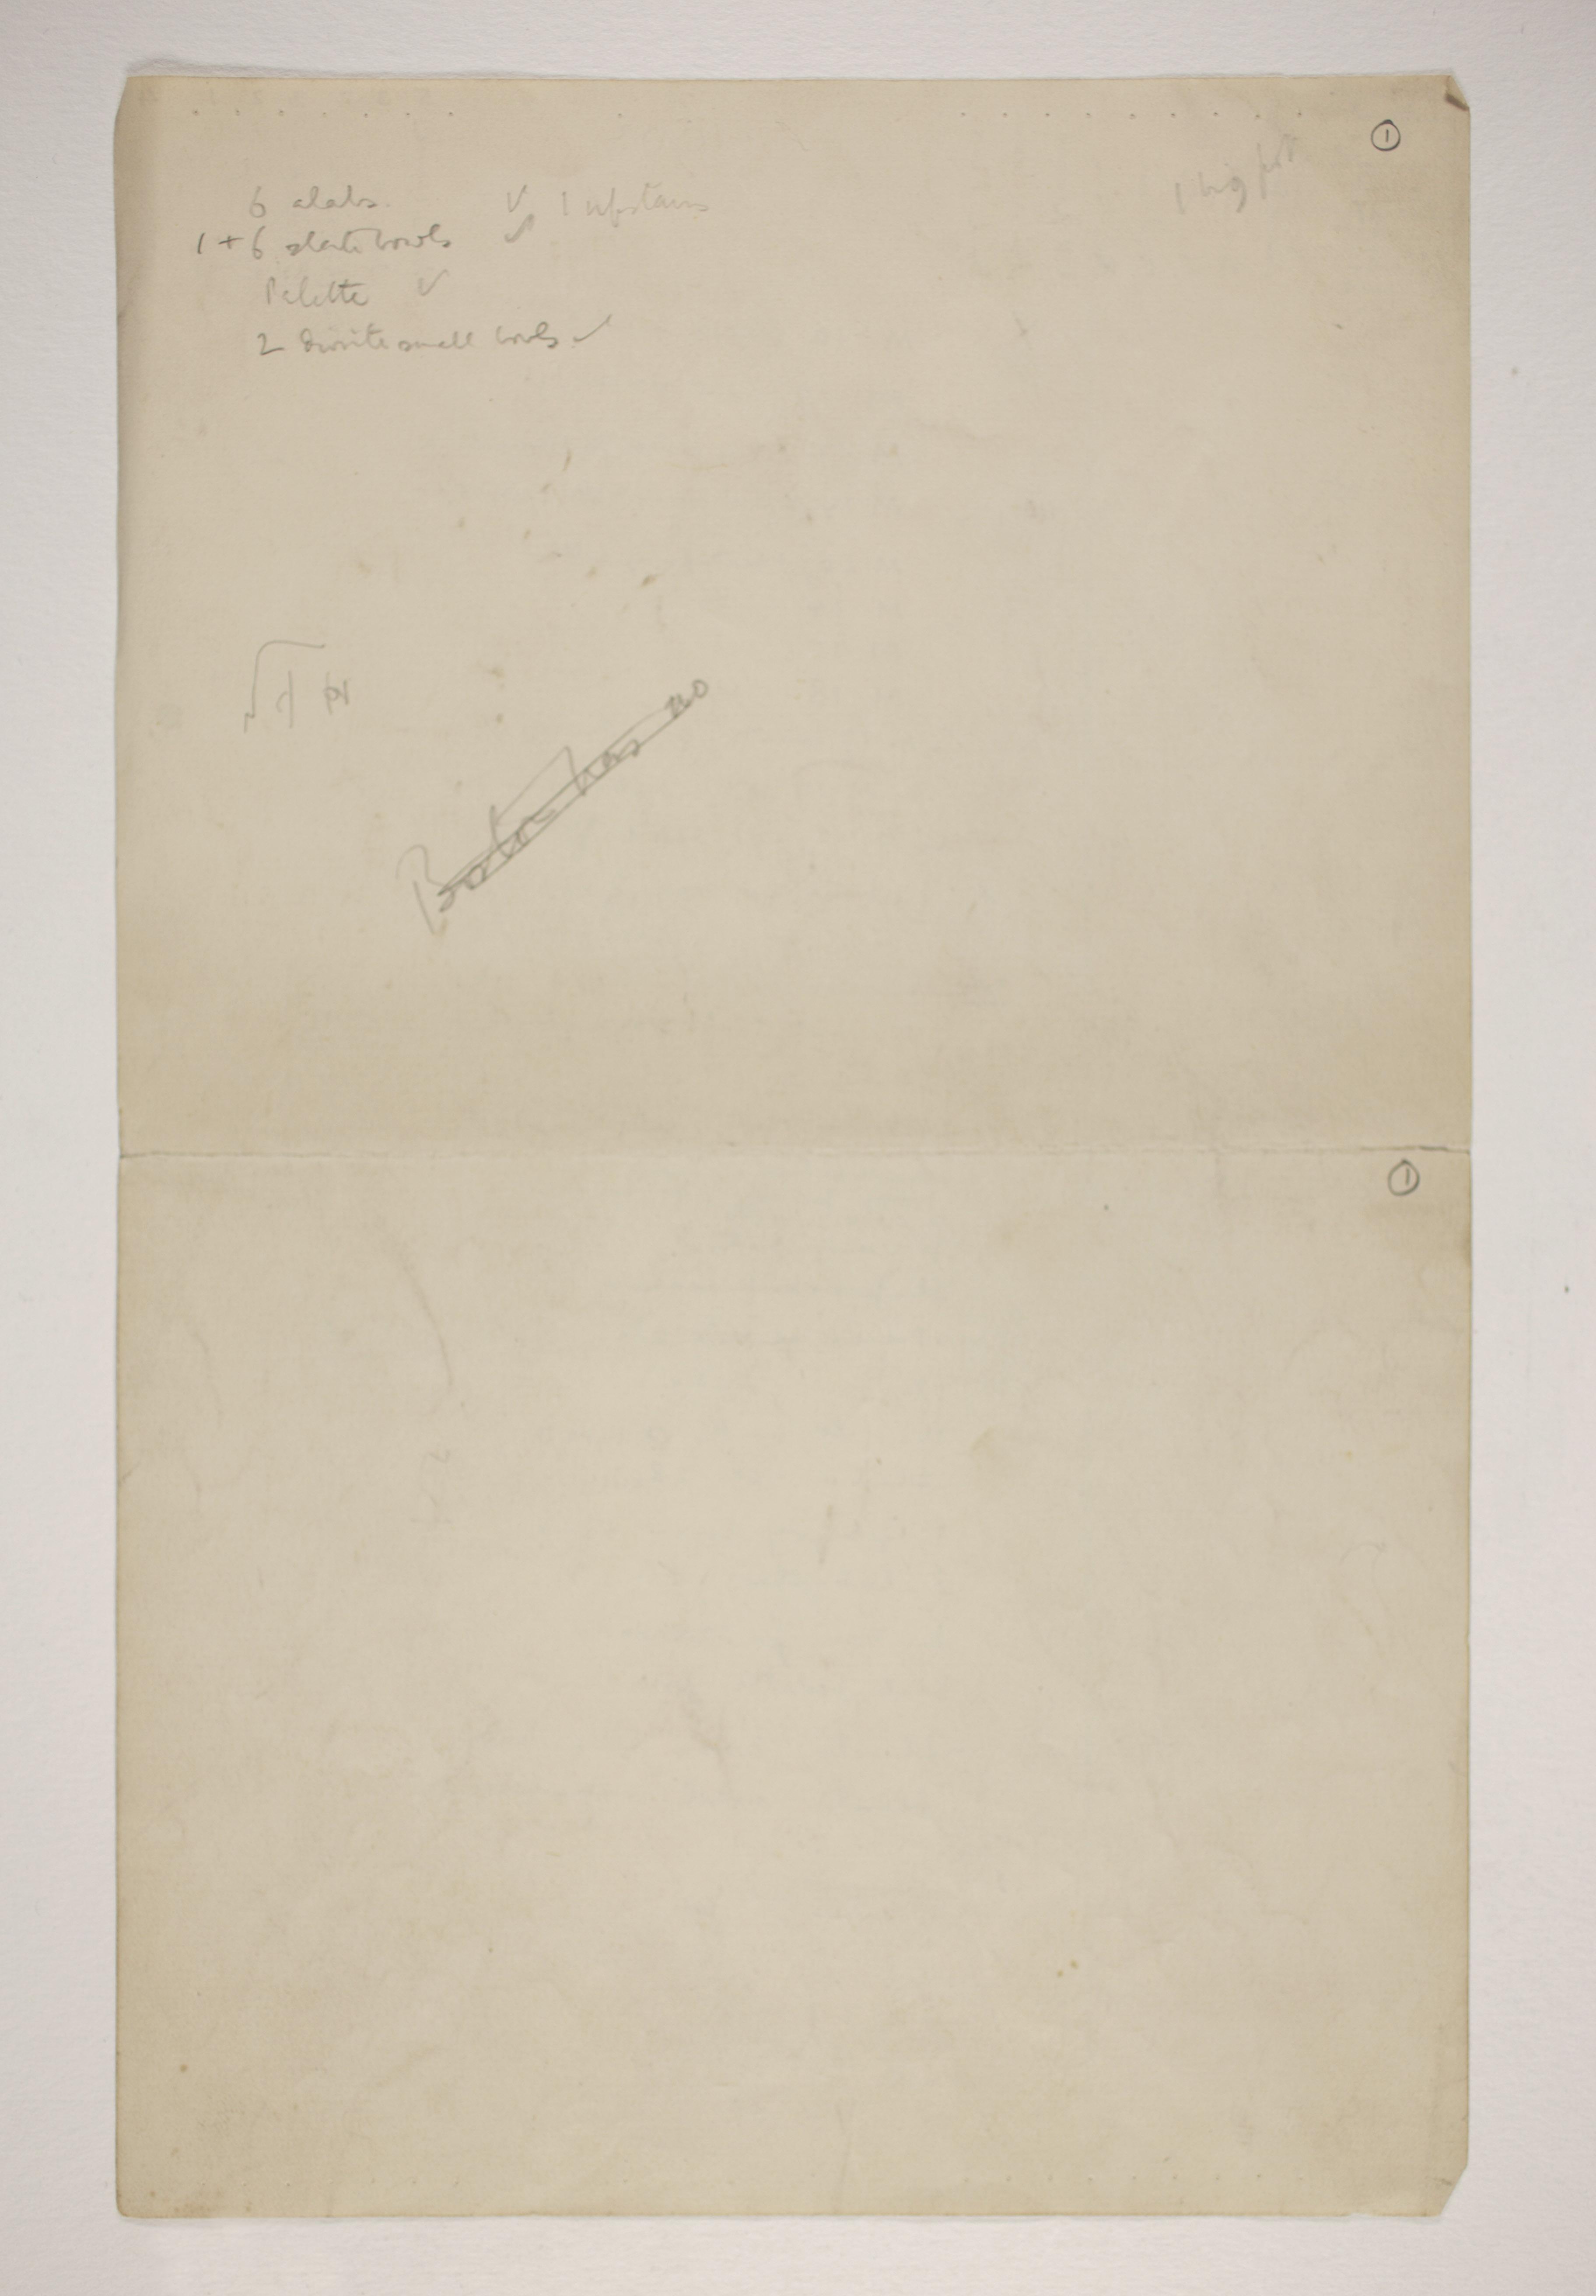 1901-02 Abydos Object list PMA/WFP1/D/10/1.2